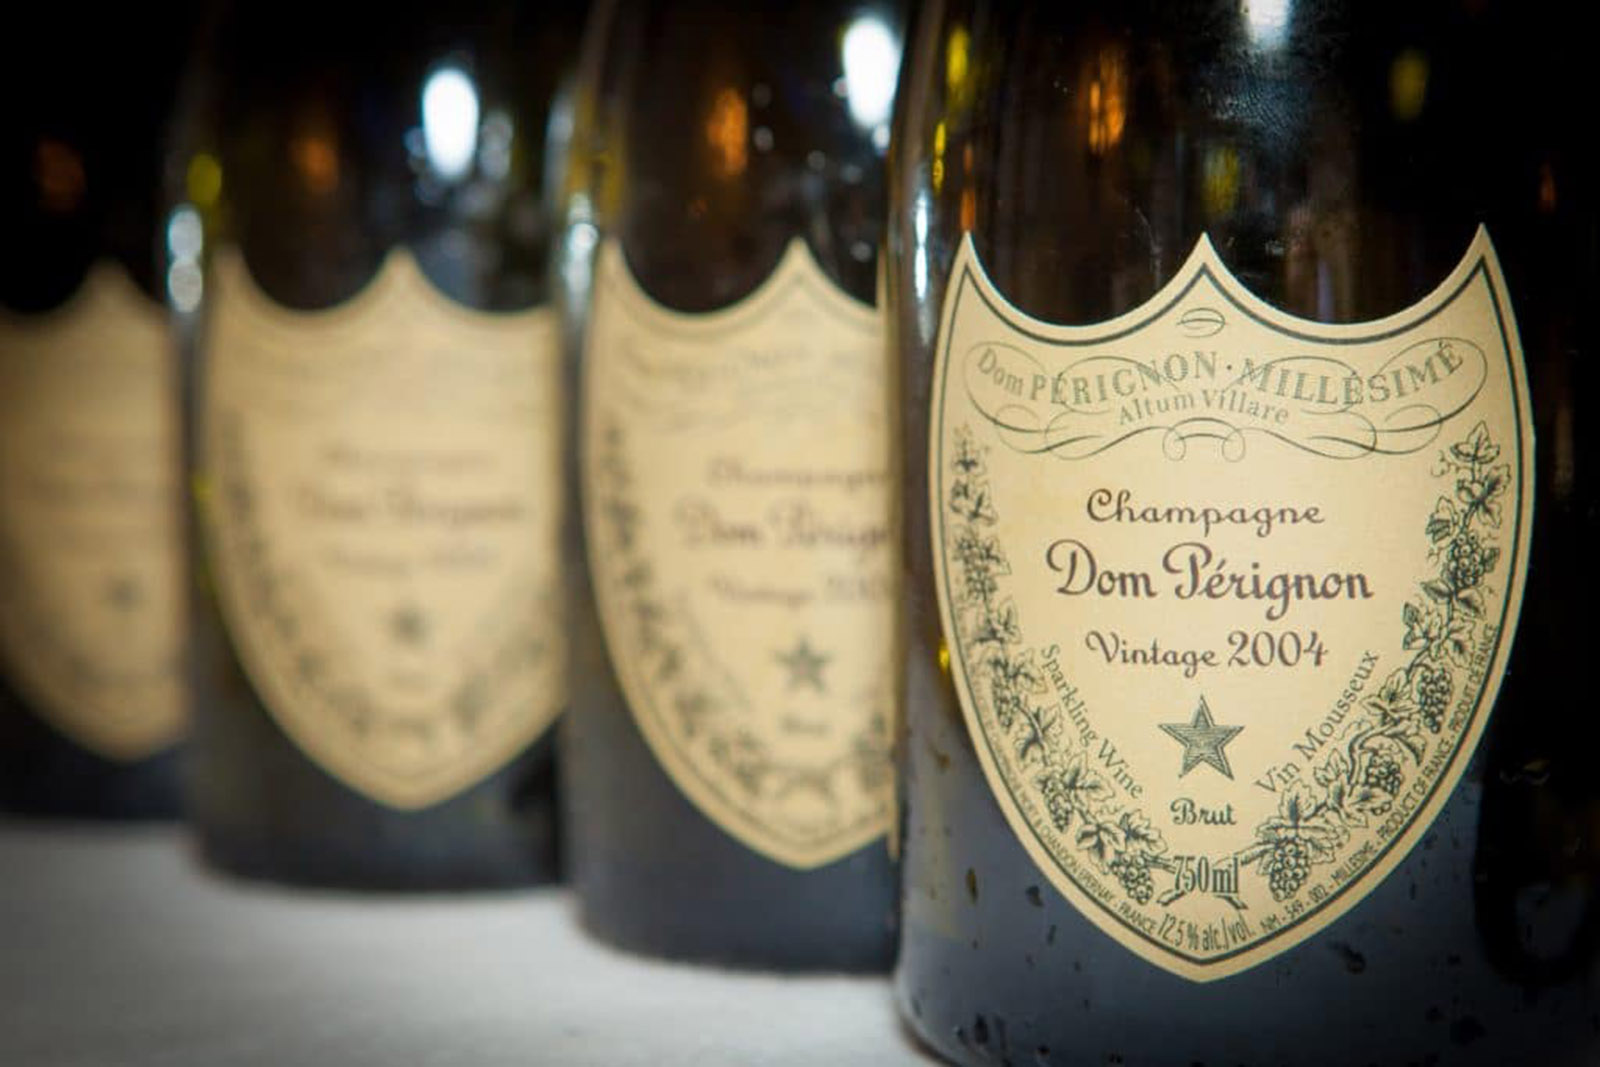 Dom Perignom en el Champagne Weekend